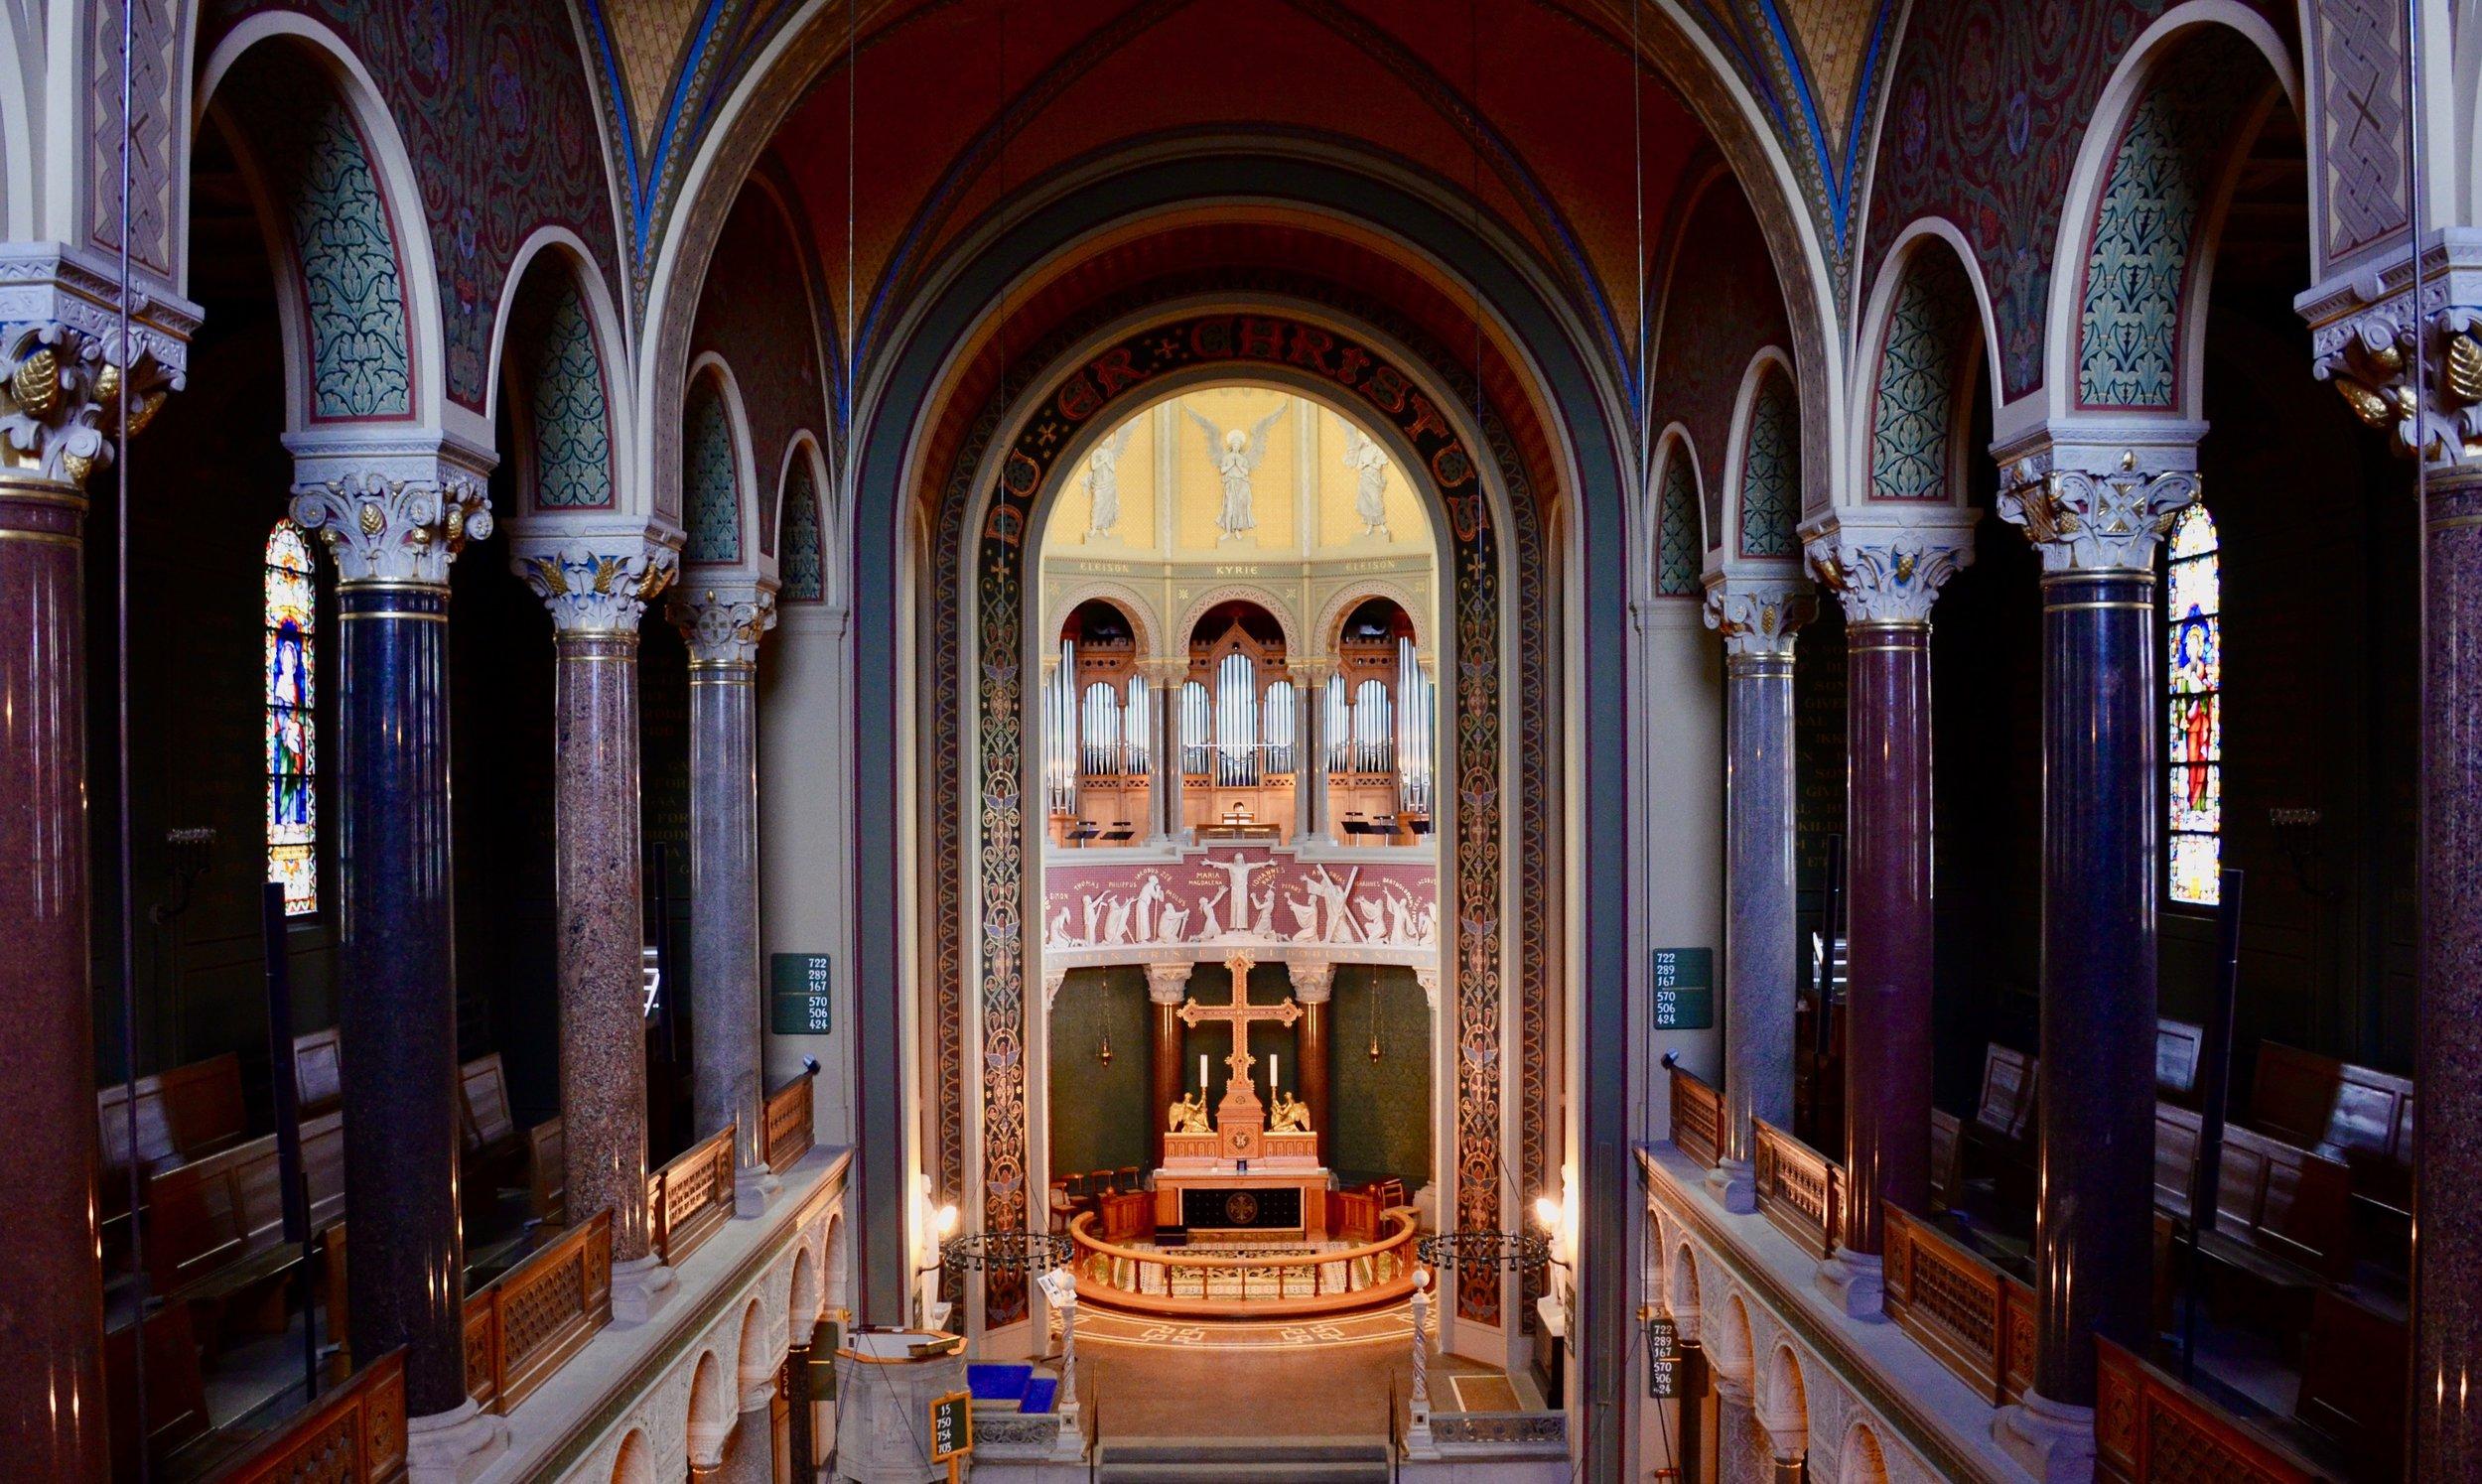 The 1890 Cavaillé-Coll organ of Jesuskirke, Copenhagen.